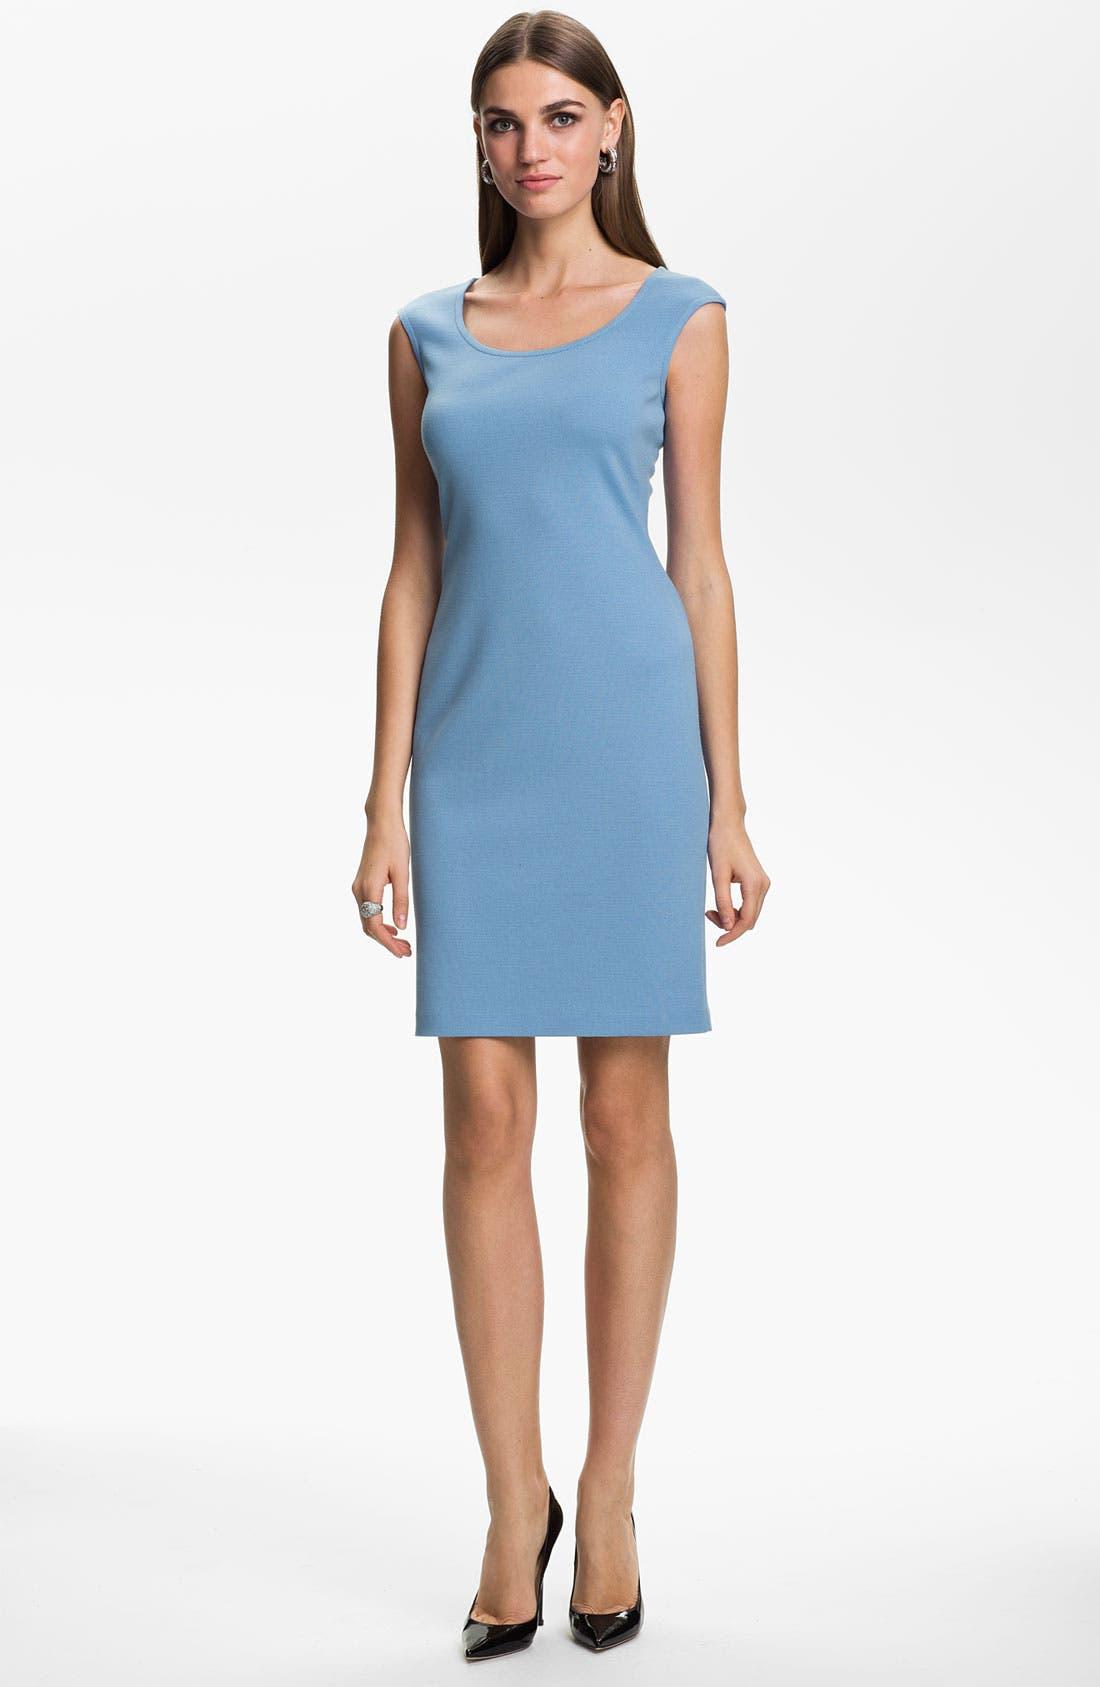 Alternate Image 1 Selected - St. John Collection Knit Sheath Dress